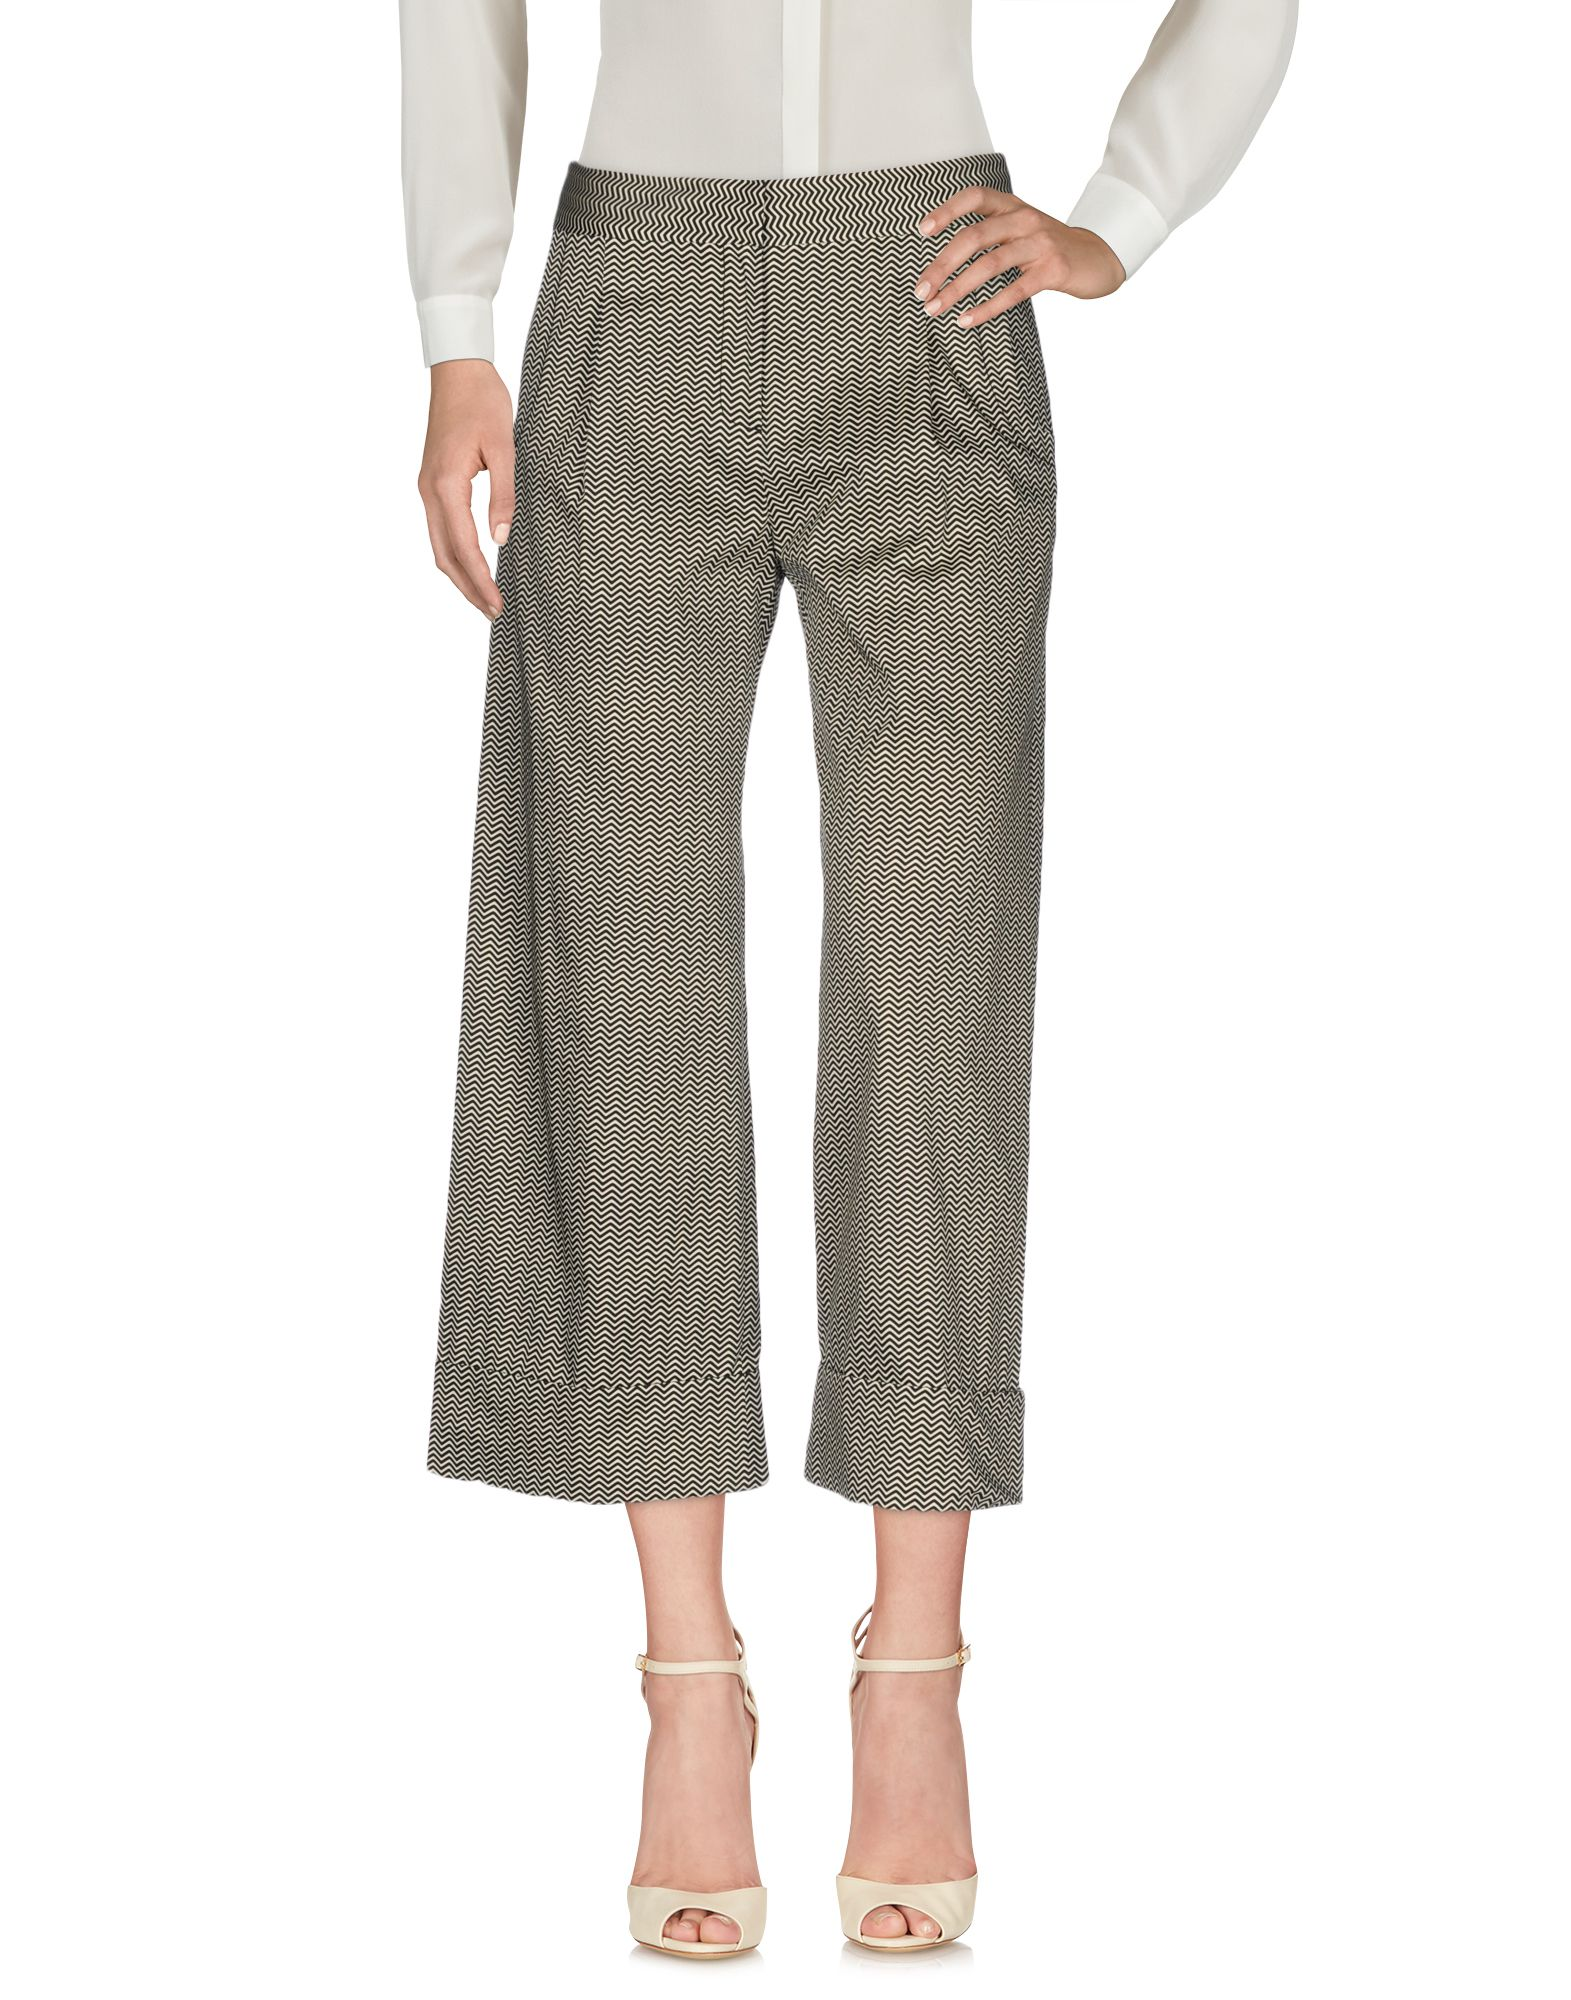 Pantalone Siyu Donna - Acquista online su SkcuGt2Qja